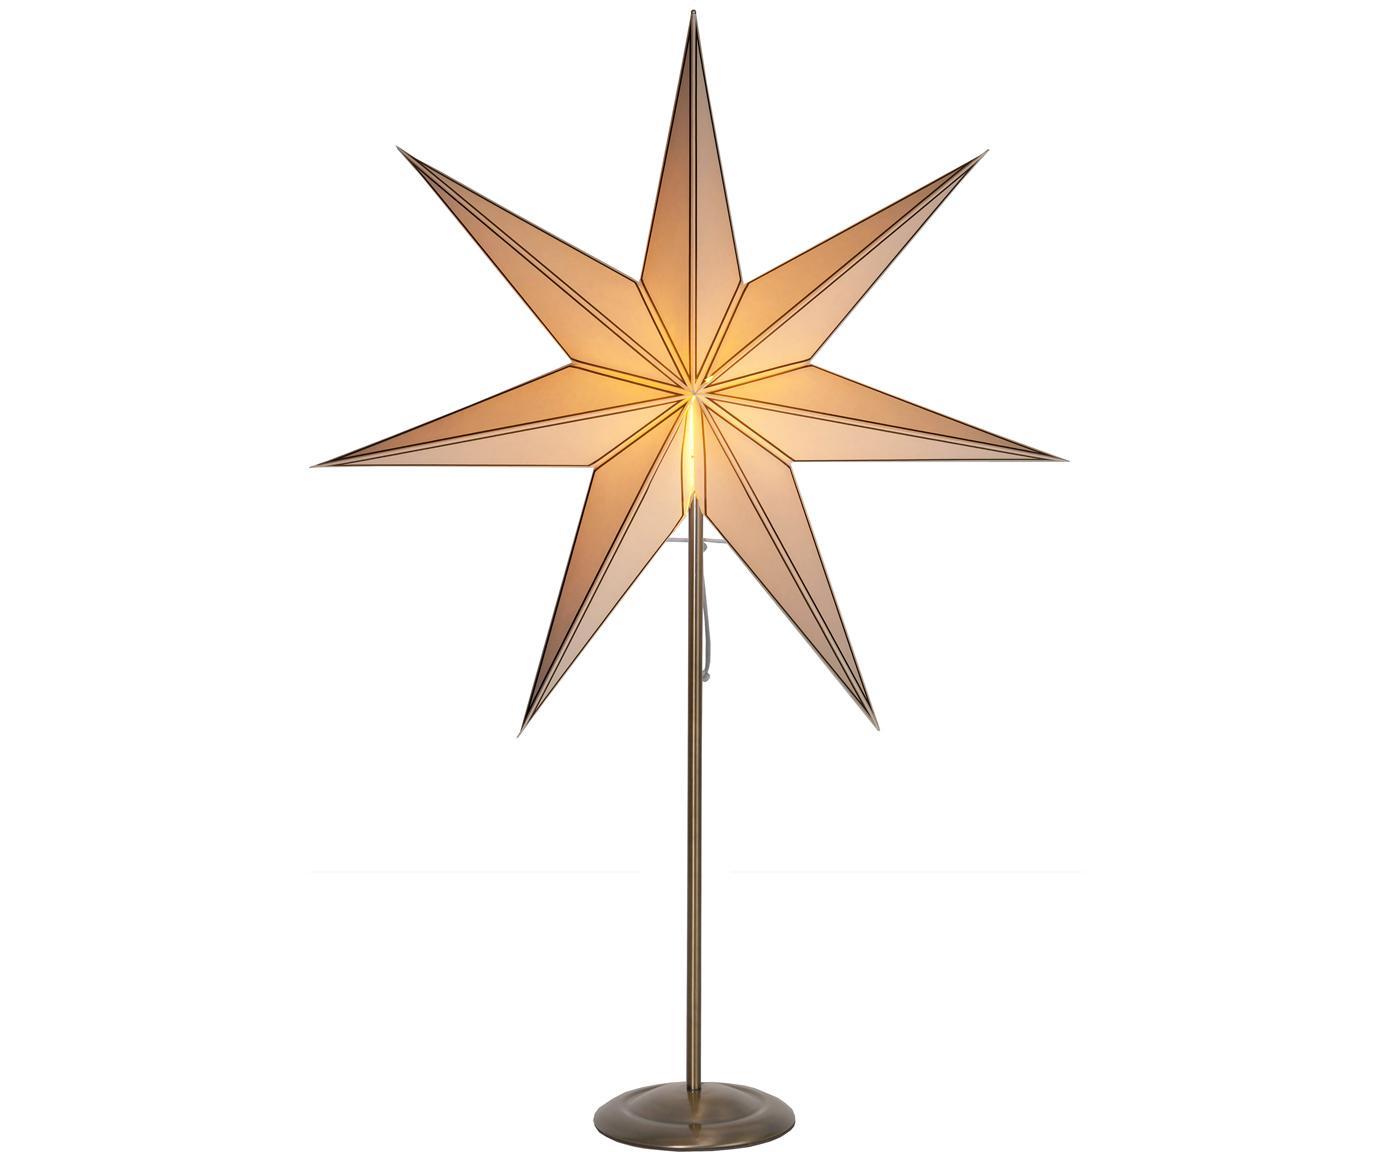 Lichtobject Nicolas, met stekker, Lampenkap: papier, Lampvoet: gecoat metaal, Beige, messingkleurig met antieke afwerking, 60 x 90 cm